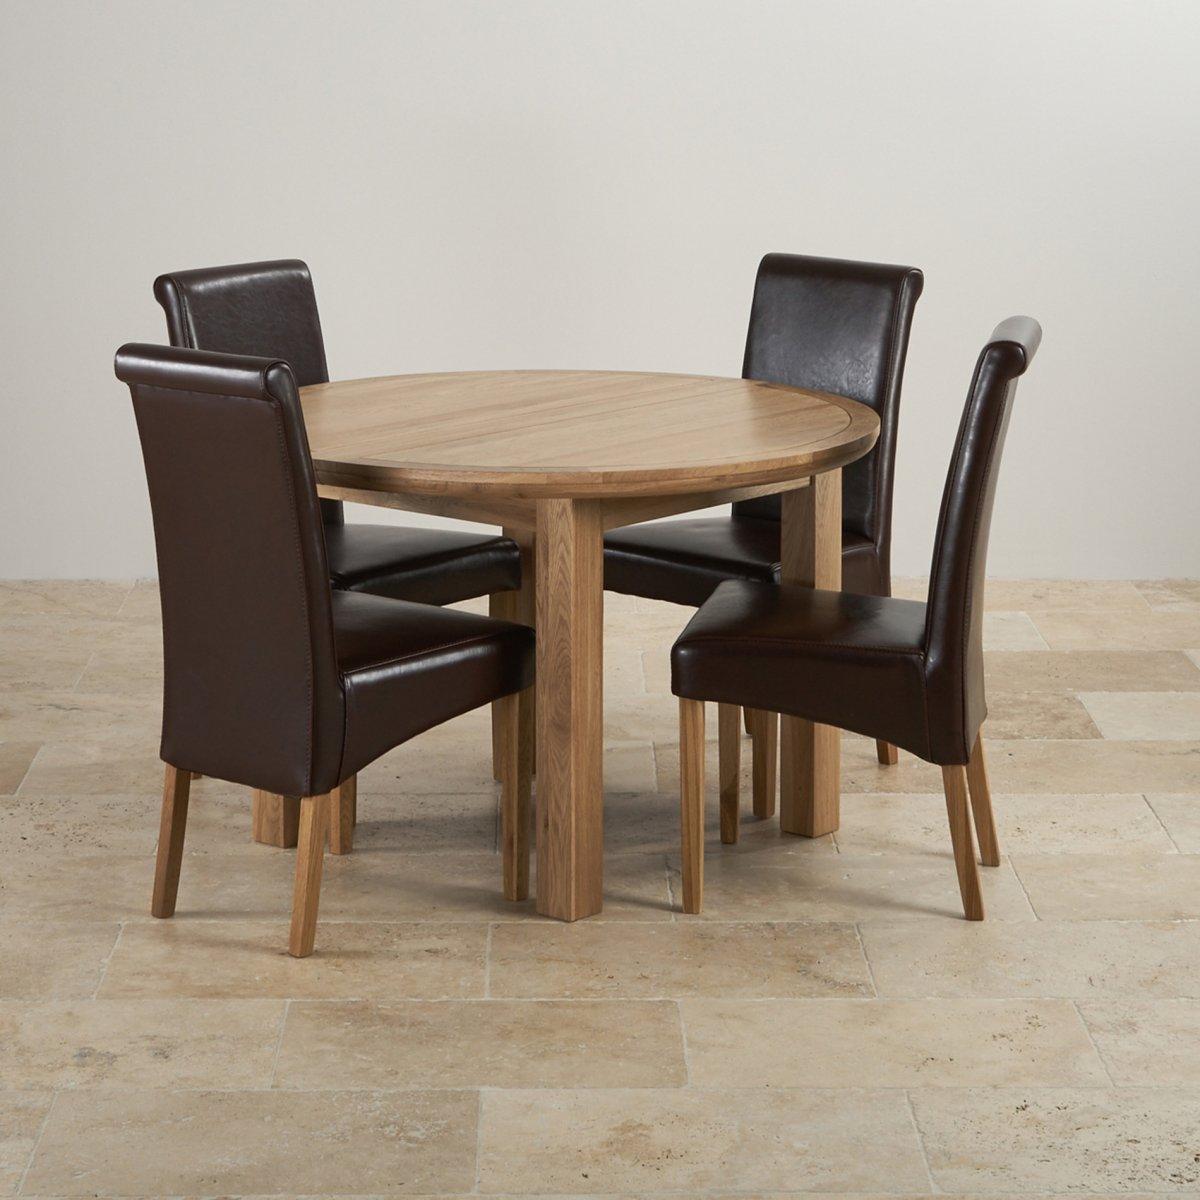 Knightsbridge Round Extending Dining Set Dining Table 4: Knightsbridge Extending Dining Set: Oak Table + 4 Leather